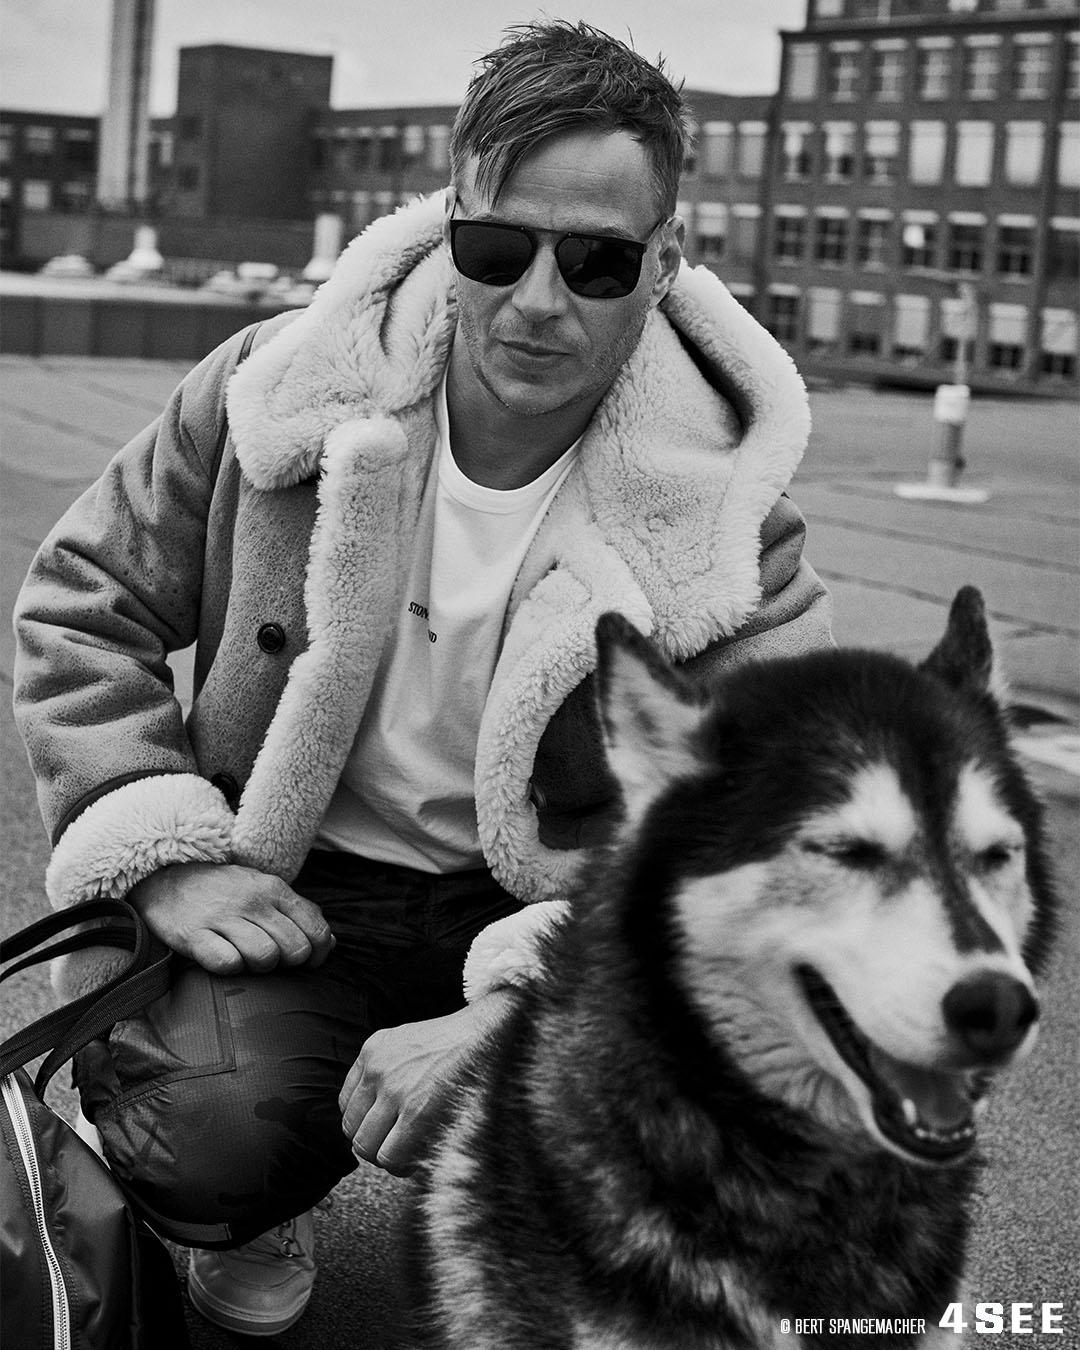 4SEE Interview with Tom Wlaschiha, Photography by Bert Spangemacher, Eyewear by Blackfin